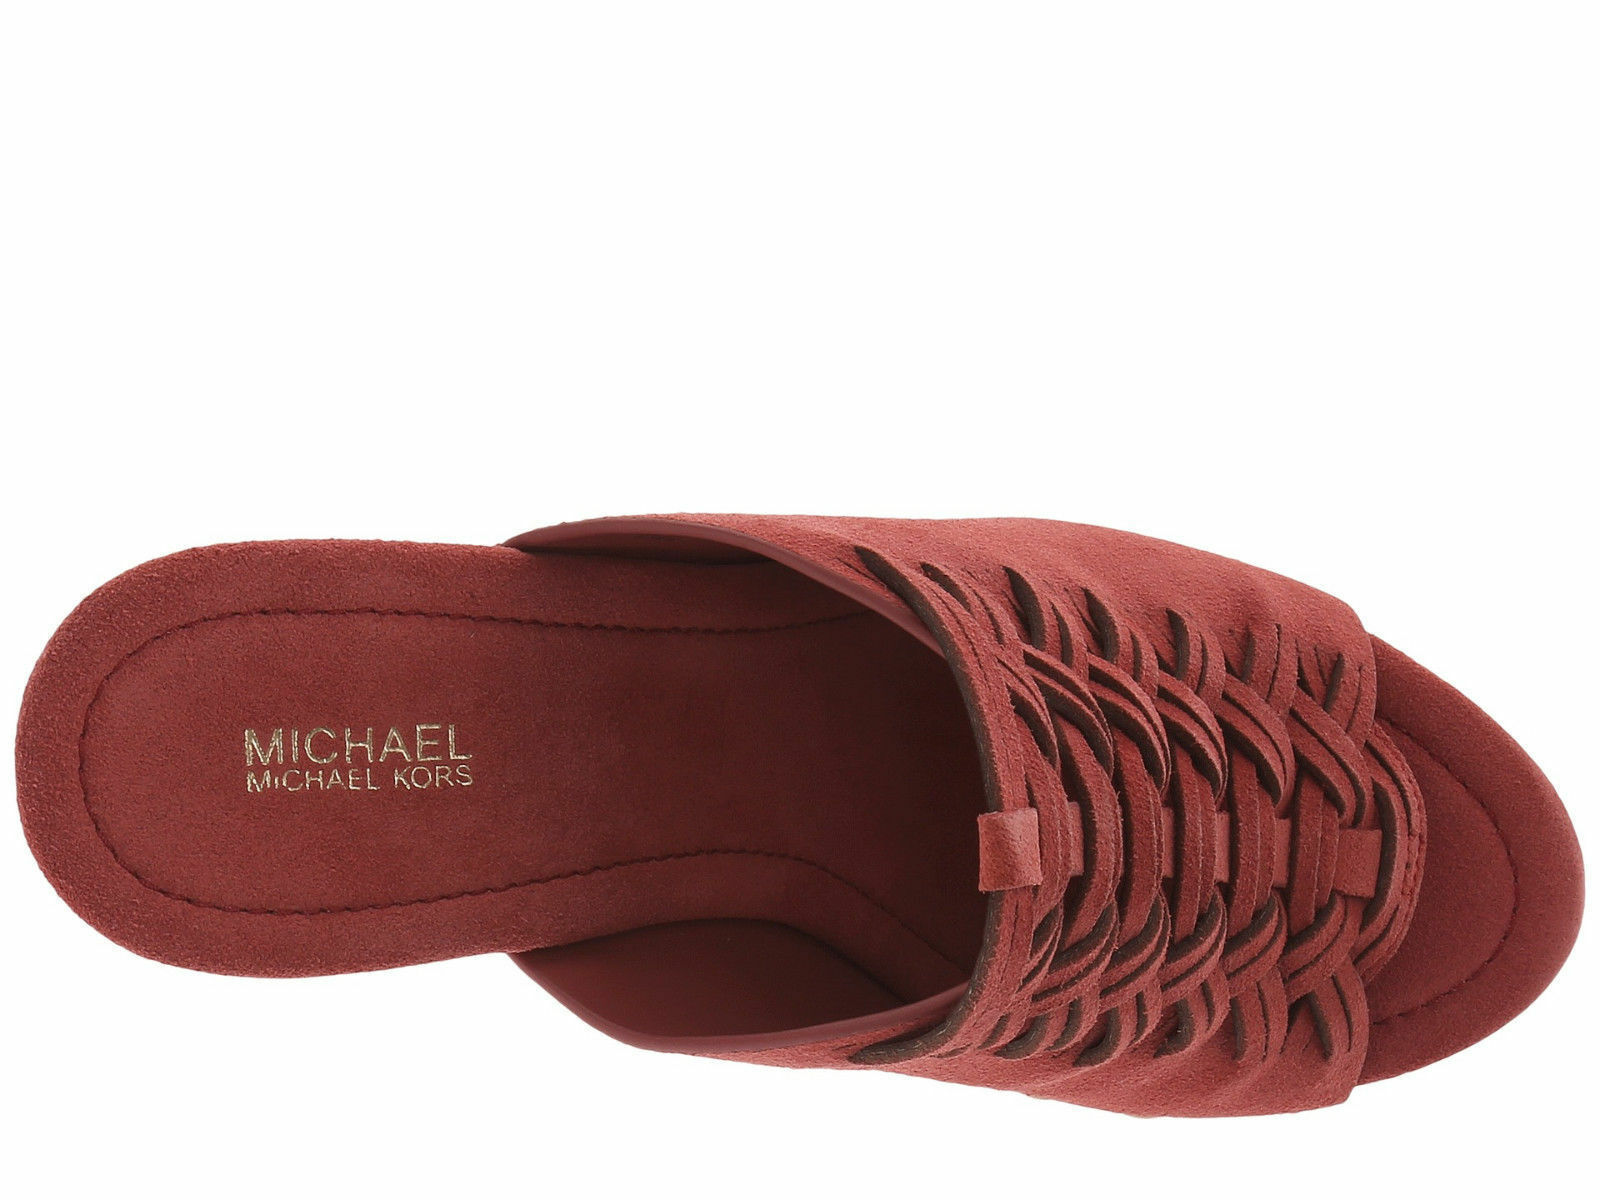 New Michael Kors Women Westley Studs Platform Mules Variety Color&Sizes image 8